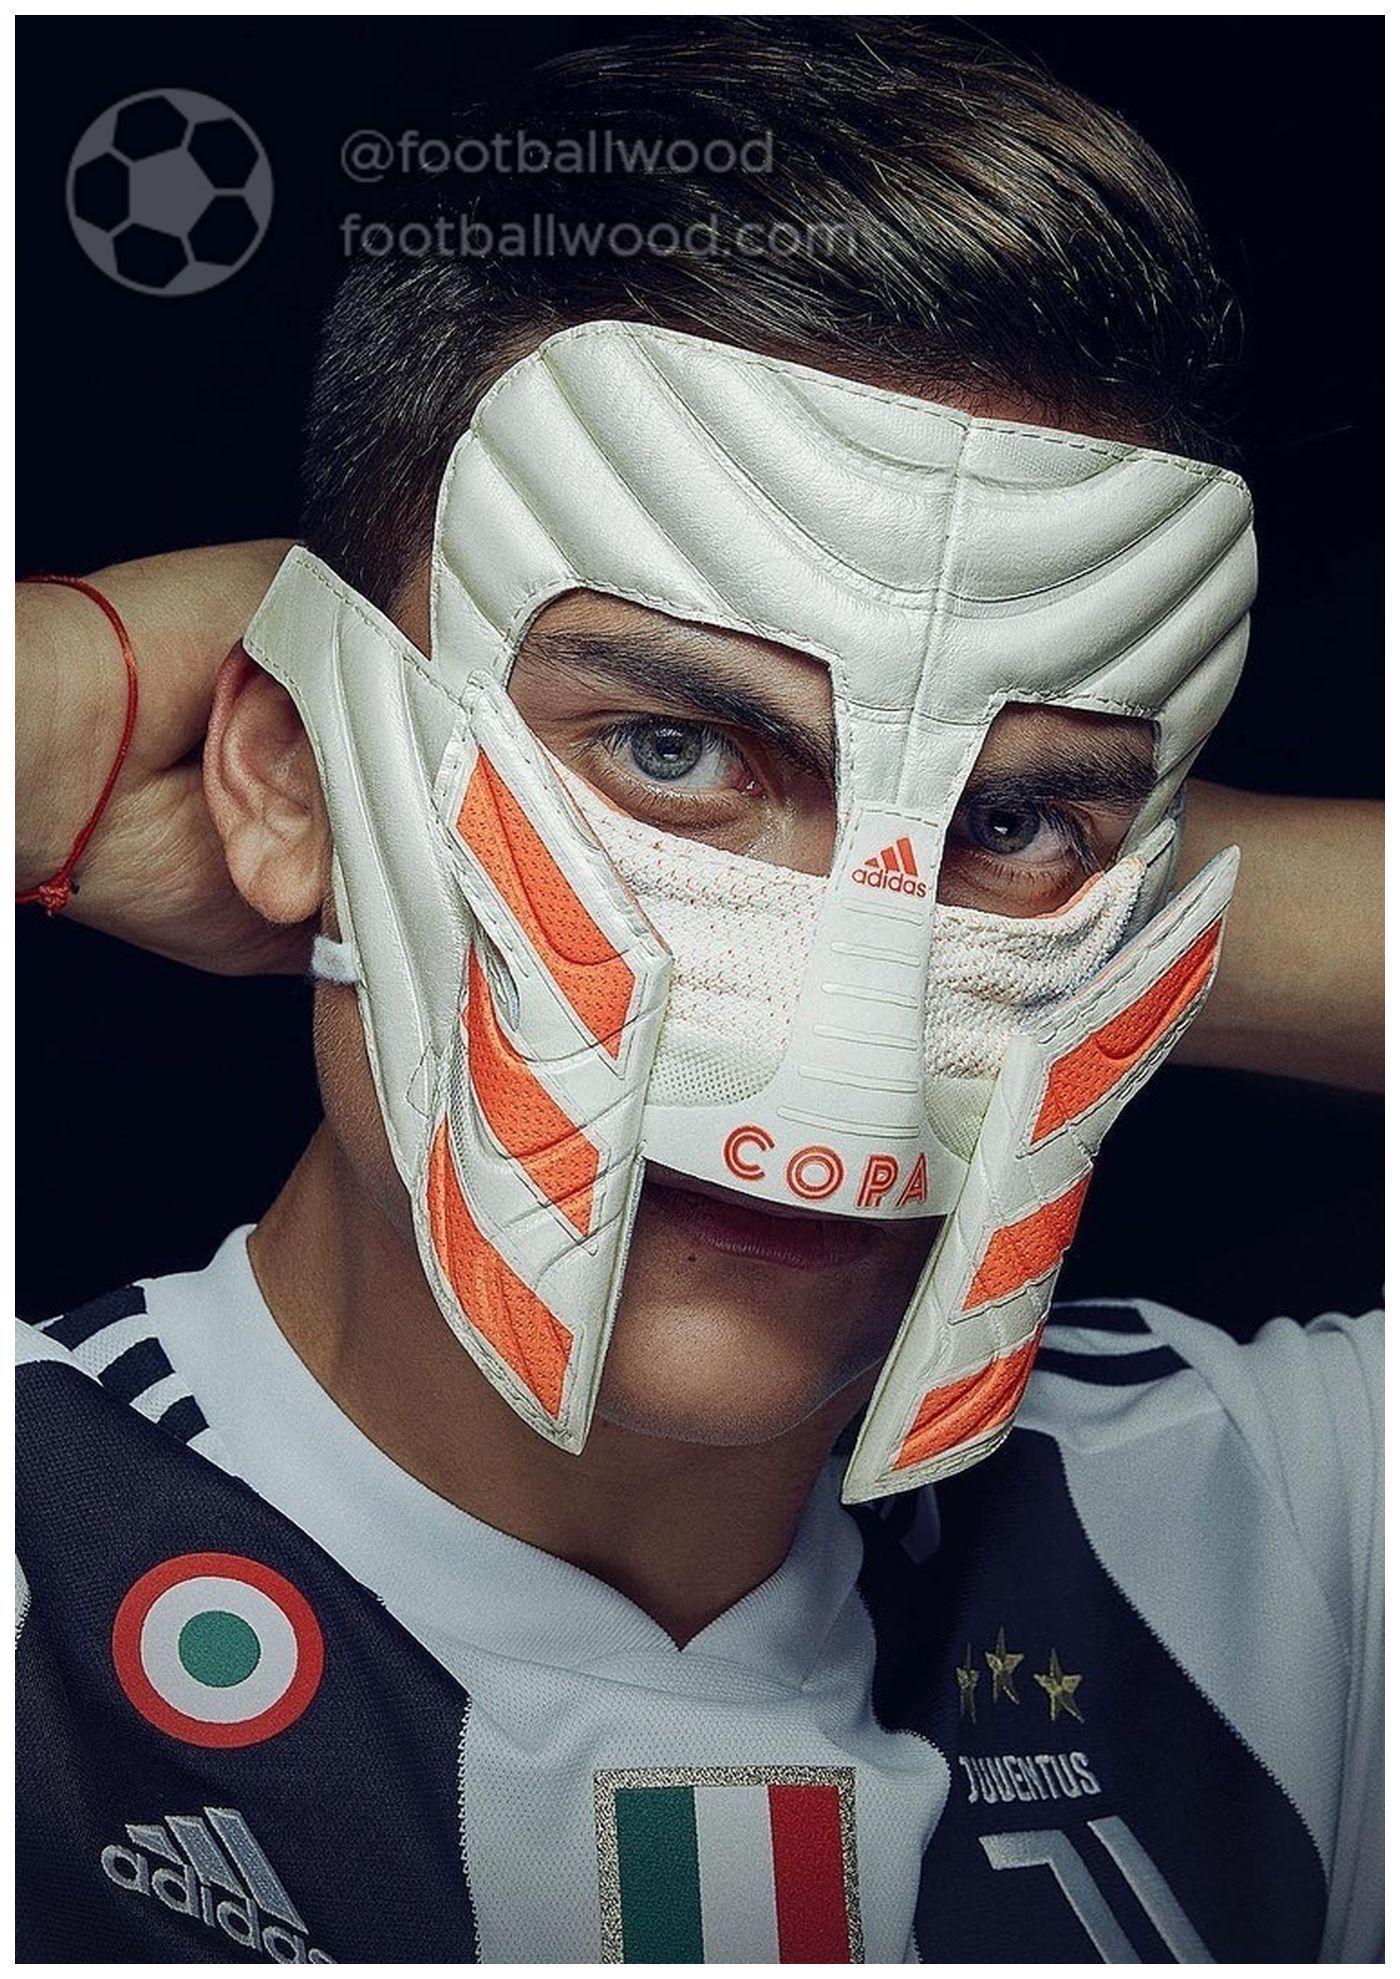 Adidas Made A Gladiator Mask For Dybala Perpetuating His Famous Celebration Dybala Adidas Adidas Football Juventus Soccer Ronaldo Juventus